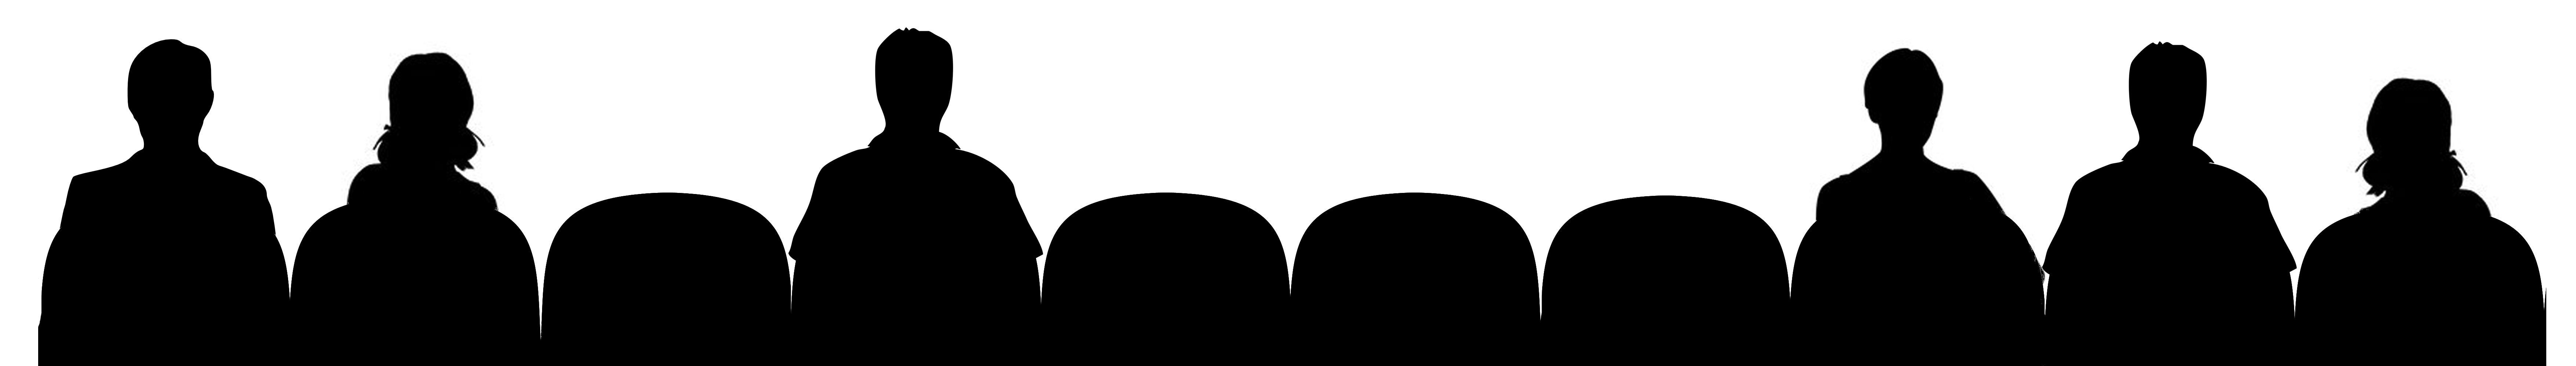 Moviegoers silhouette | Becoming Crafty